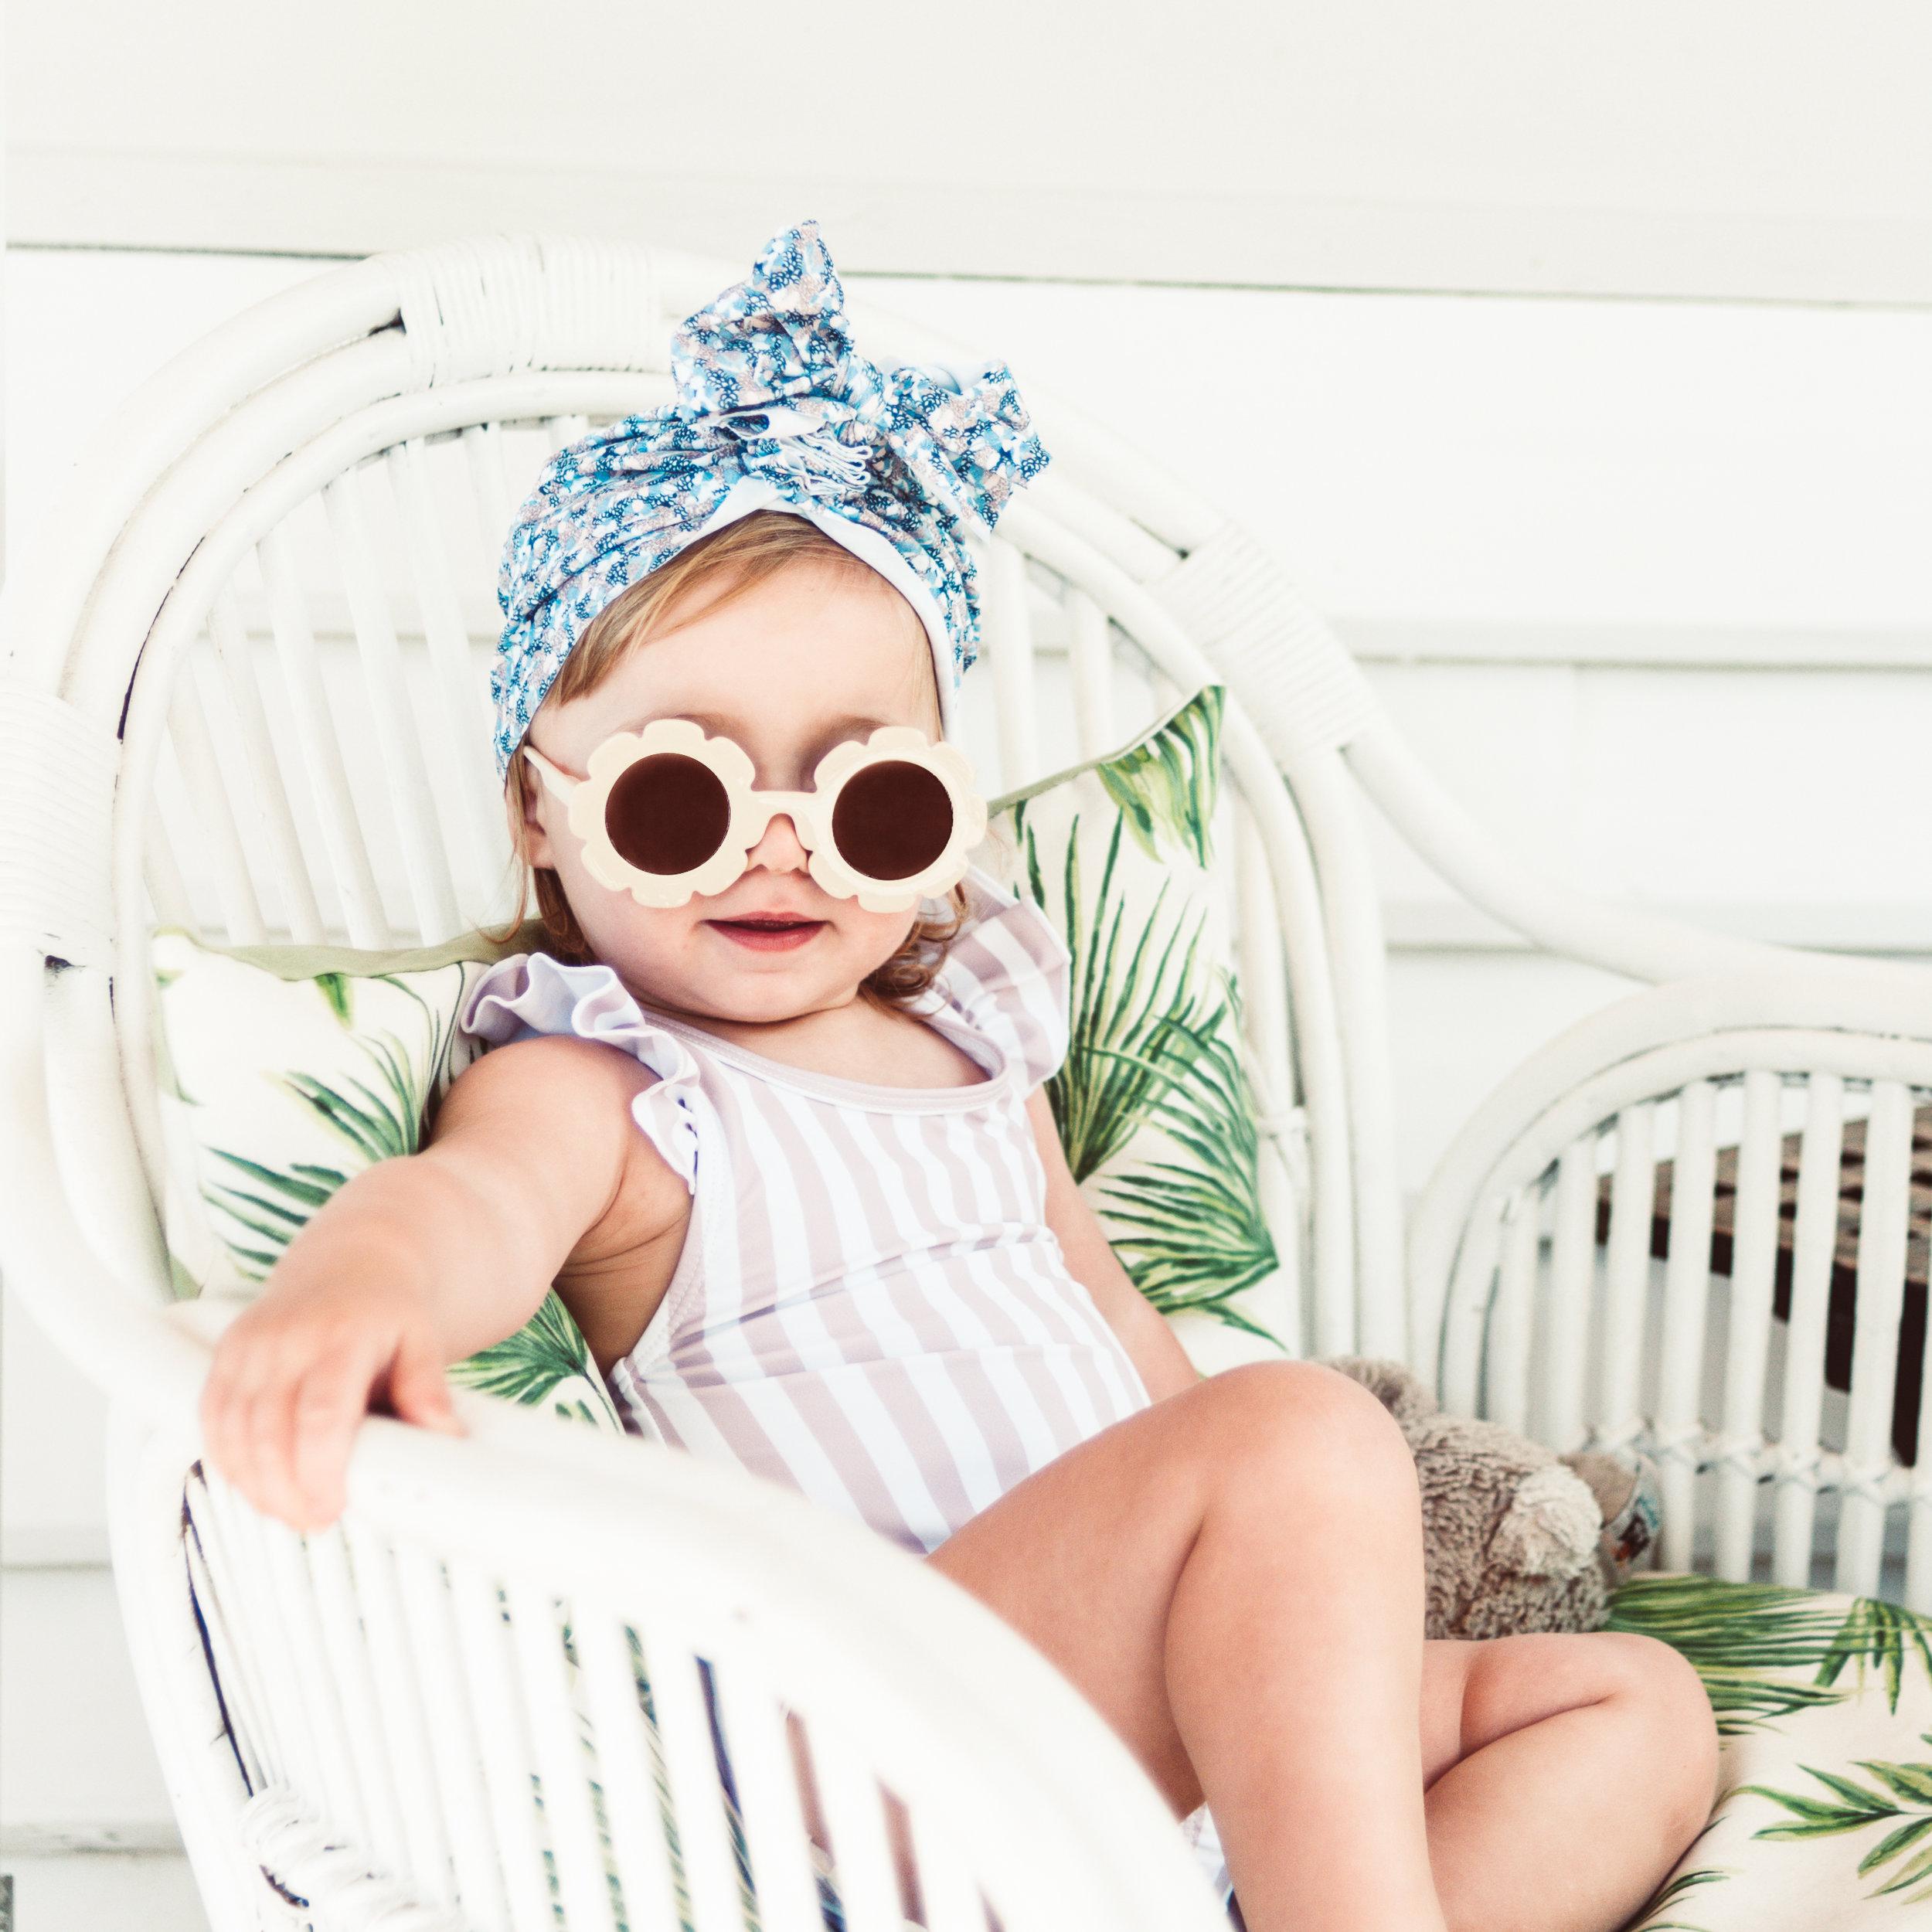 toddler swimming resort chair.jpg